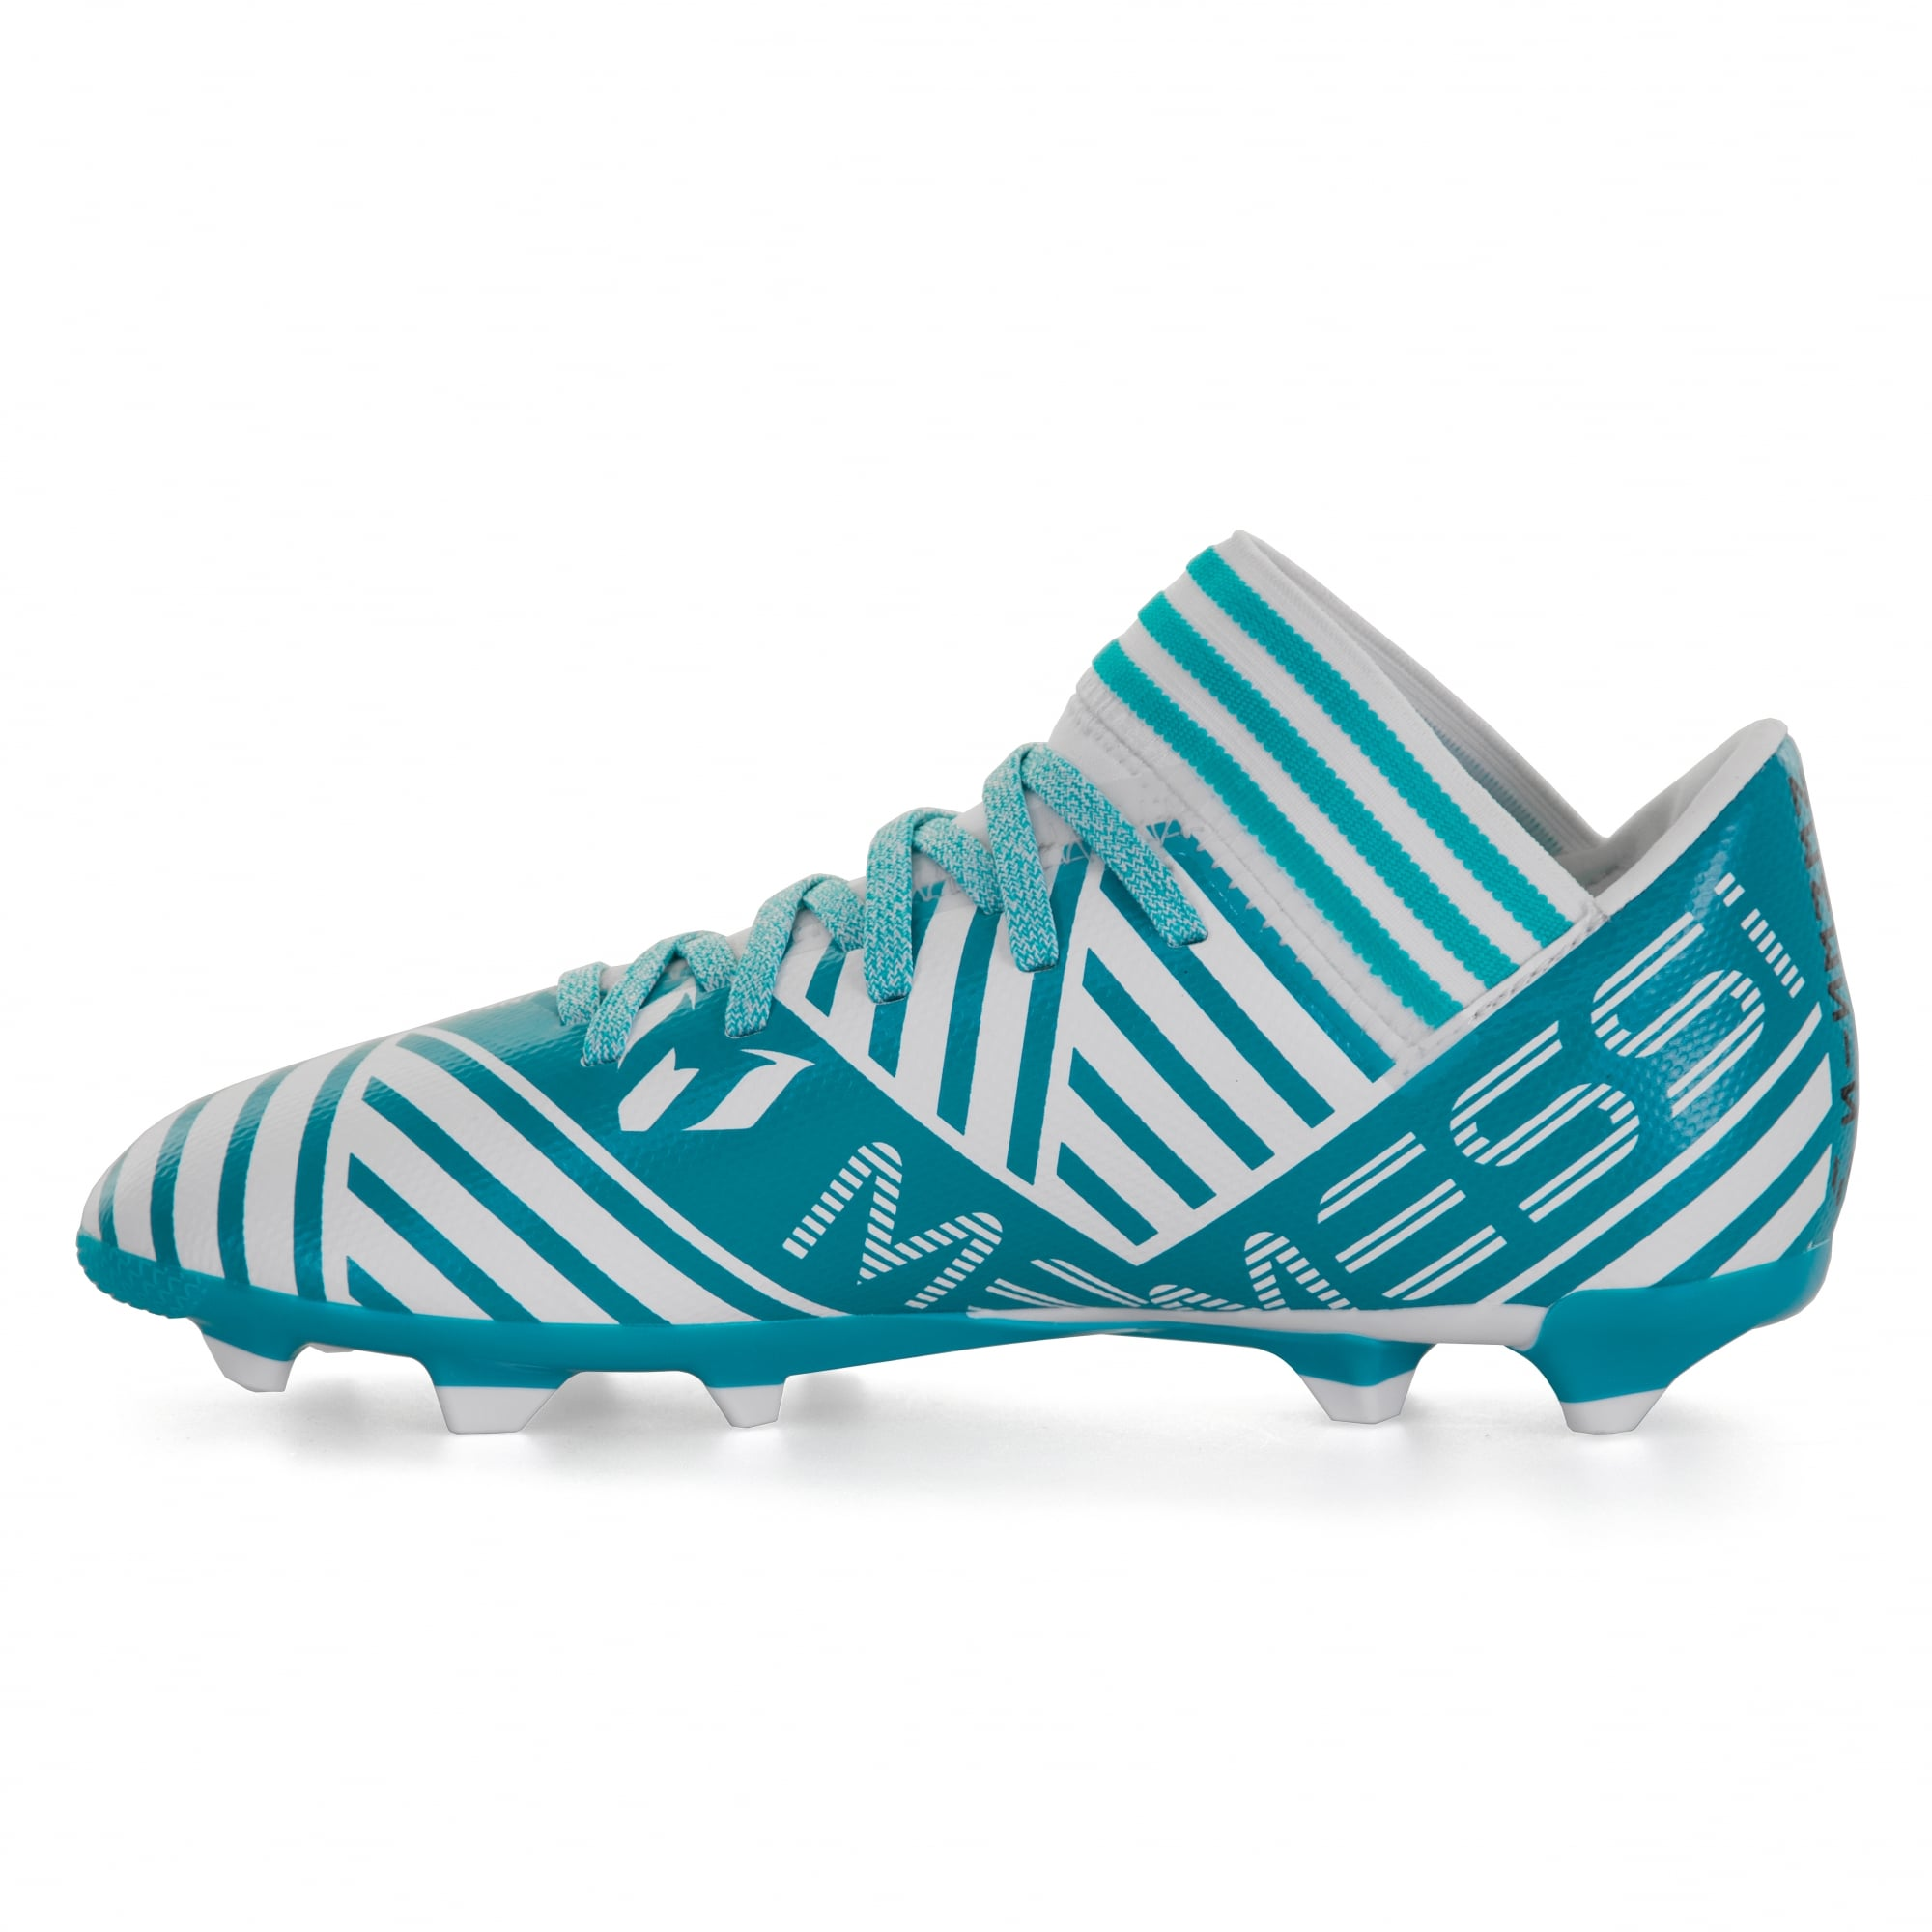 703b18273155b Adidas Performance Juniors Nemeziz Messi 17.3 FG Football Boots ...